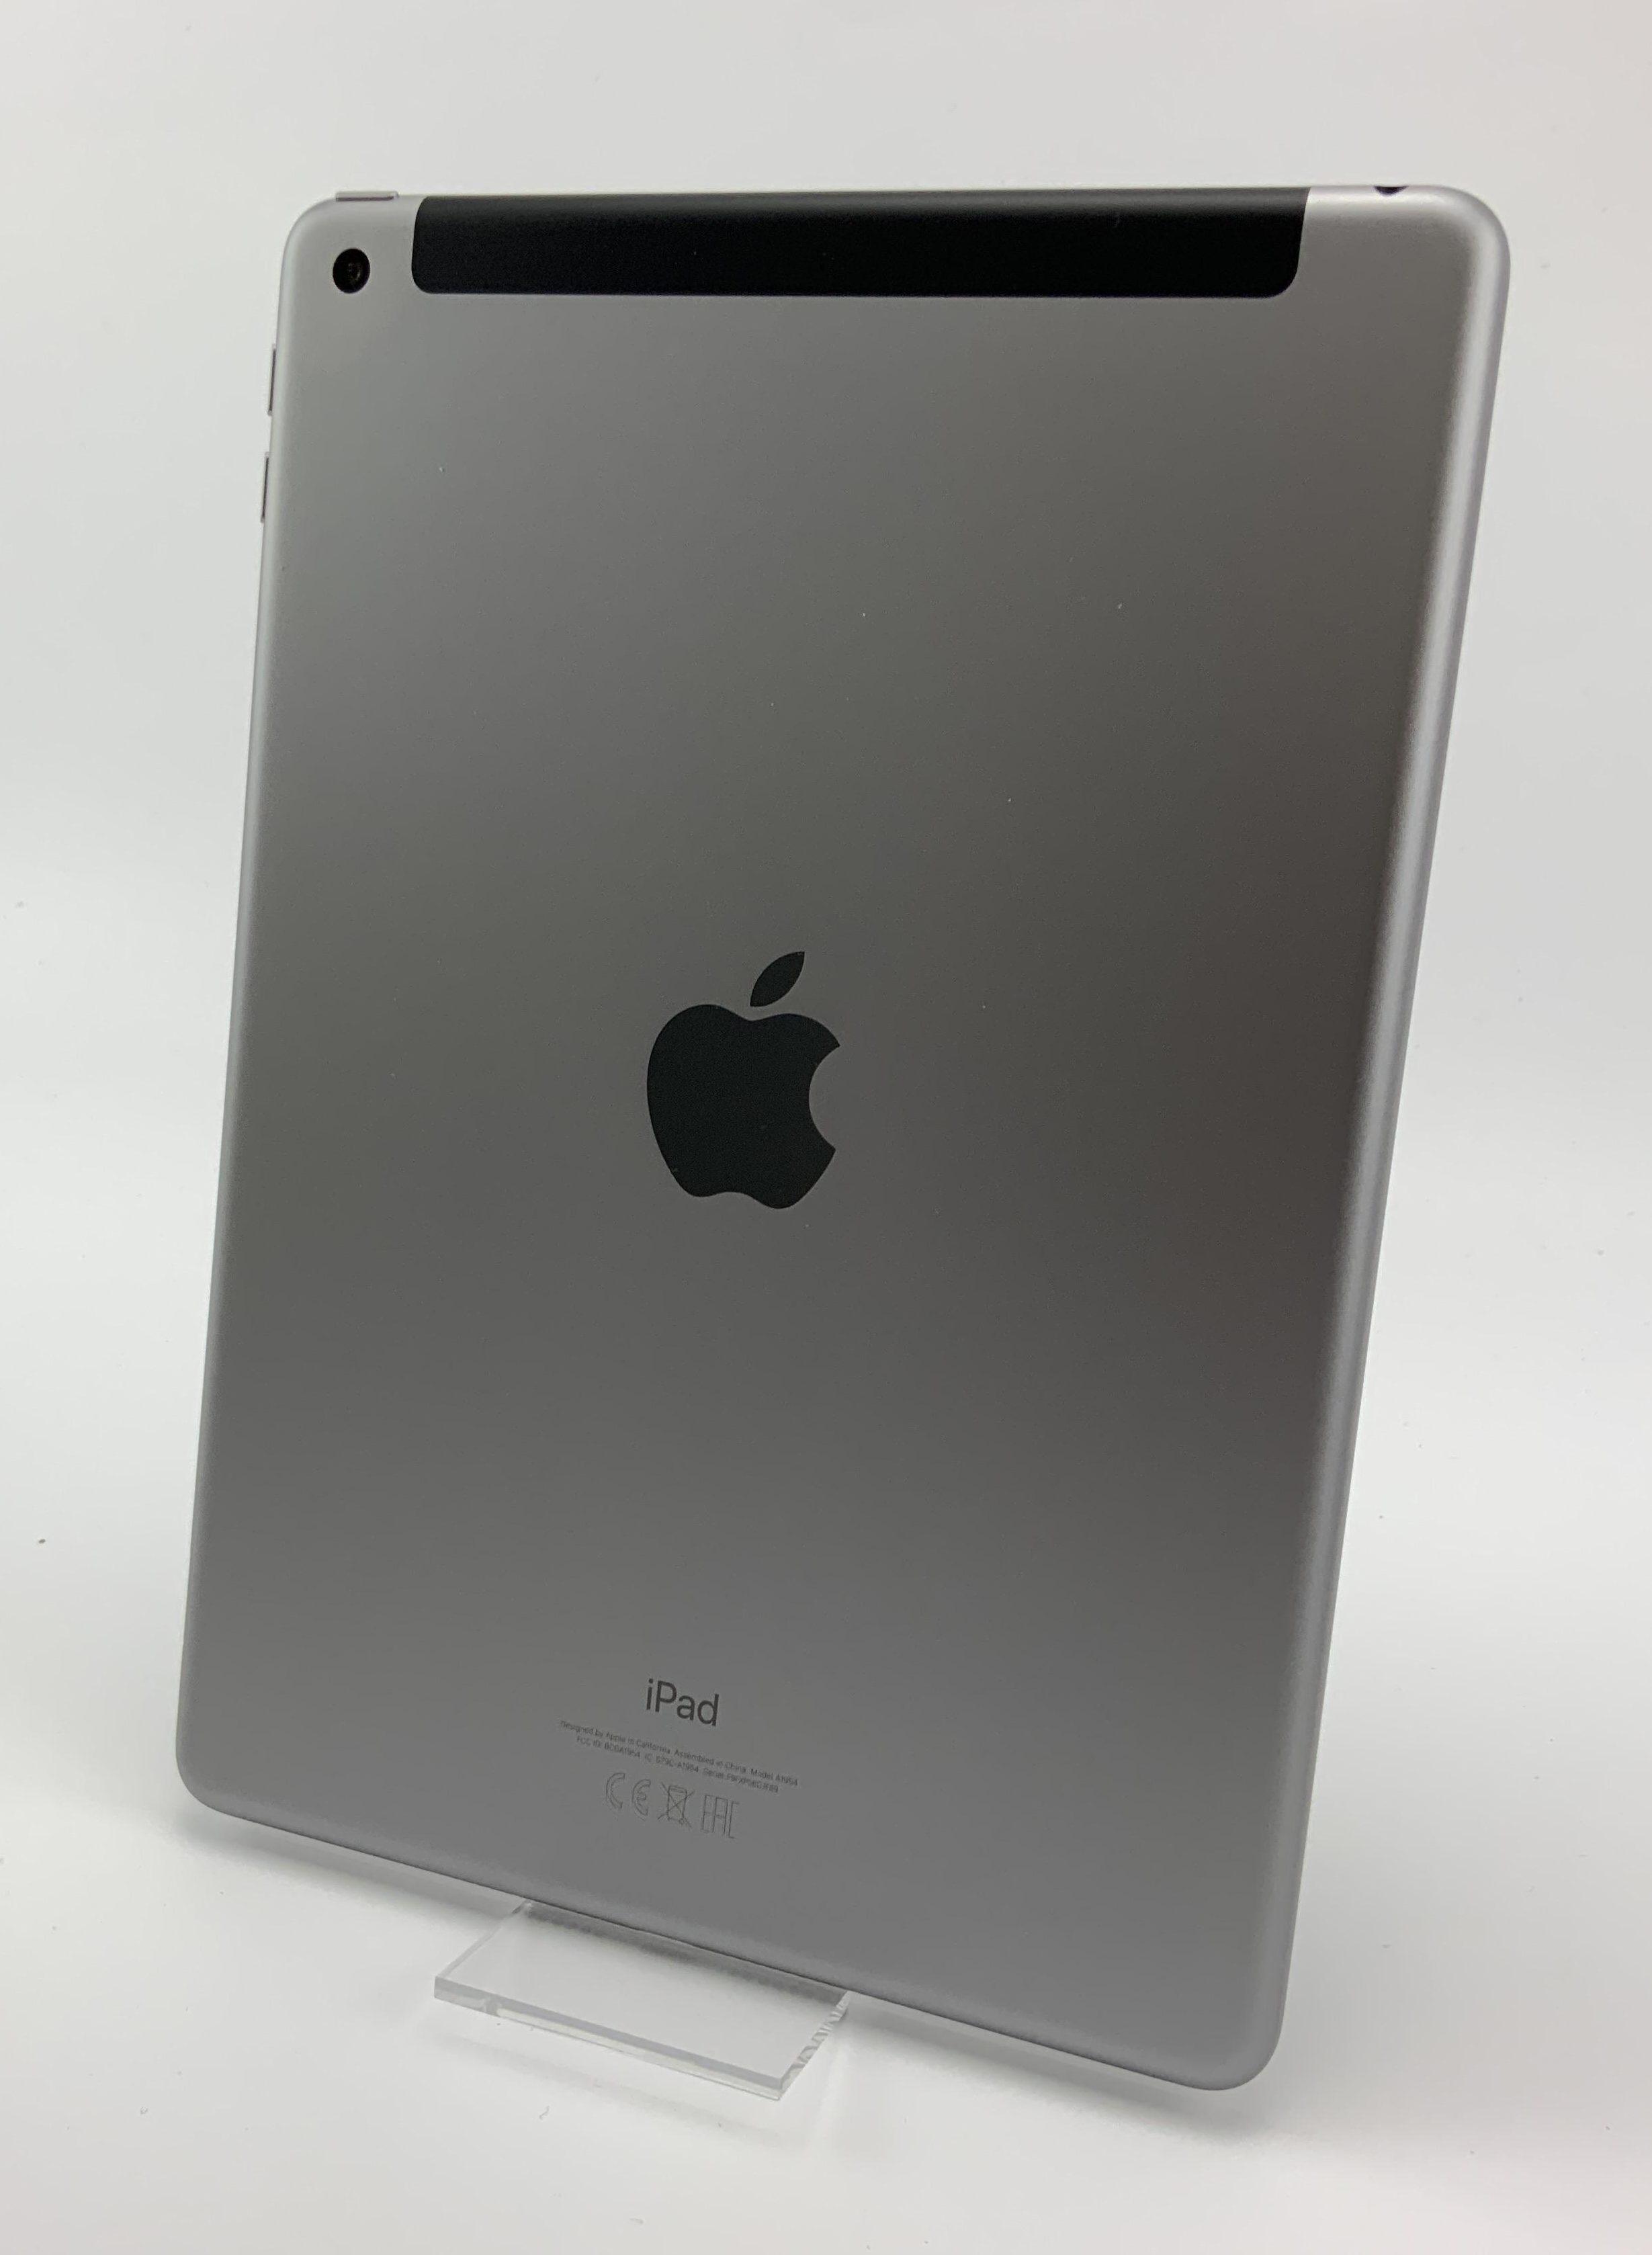 iPad 6 Wi-Fi + Cellular 128GB, 128GB, Space Gray, imagen 2